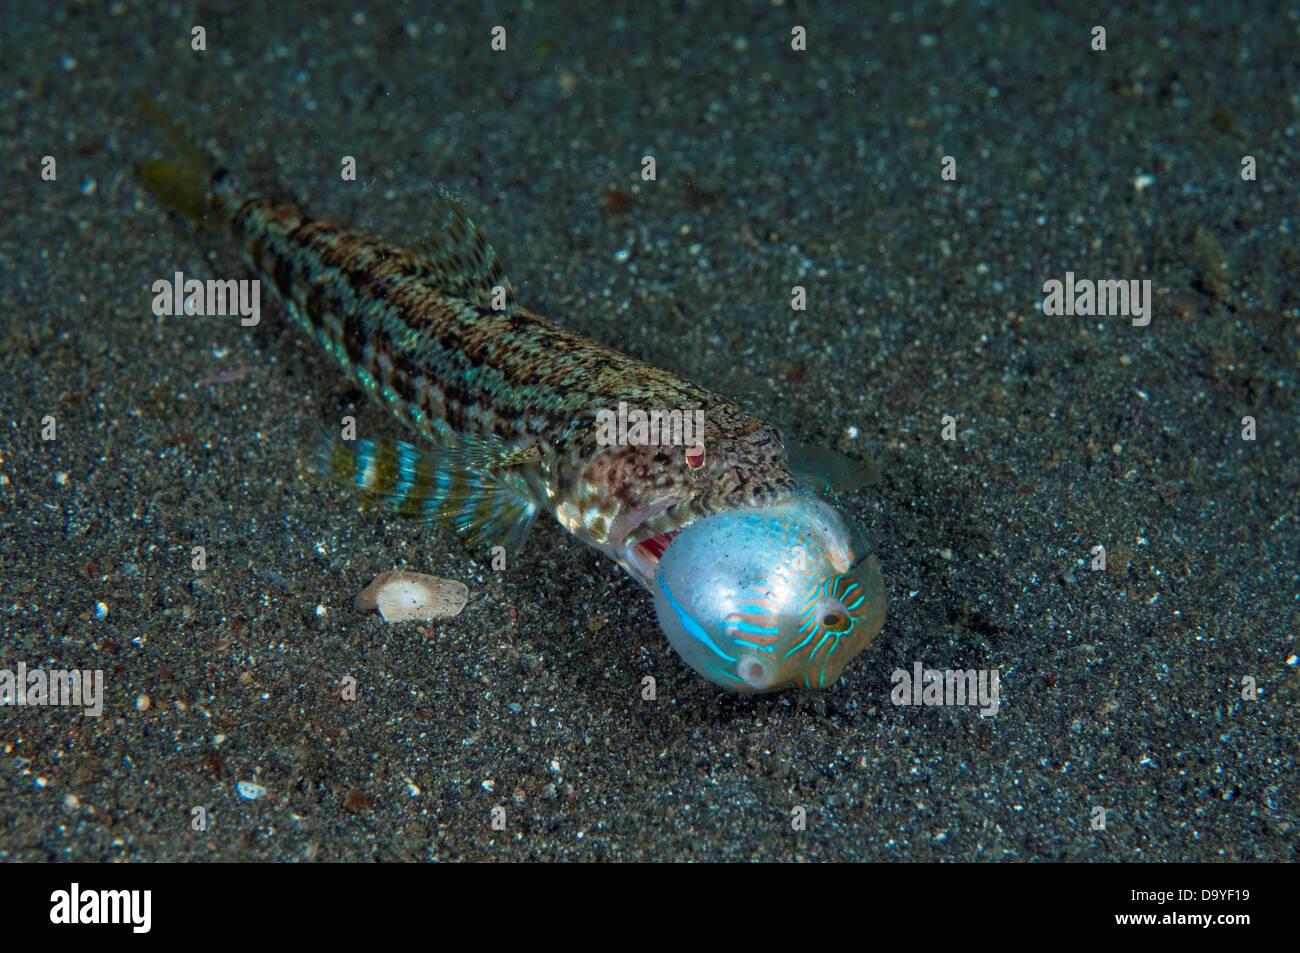 Variegated Lizardfish, Synodus variegatus, On sand with captured Toby, Lembeh Strait, Sulawesi, Indonesia Stock Photo